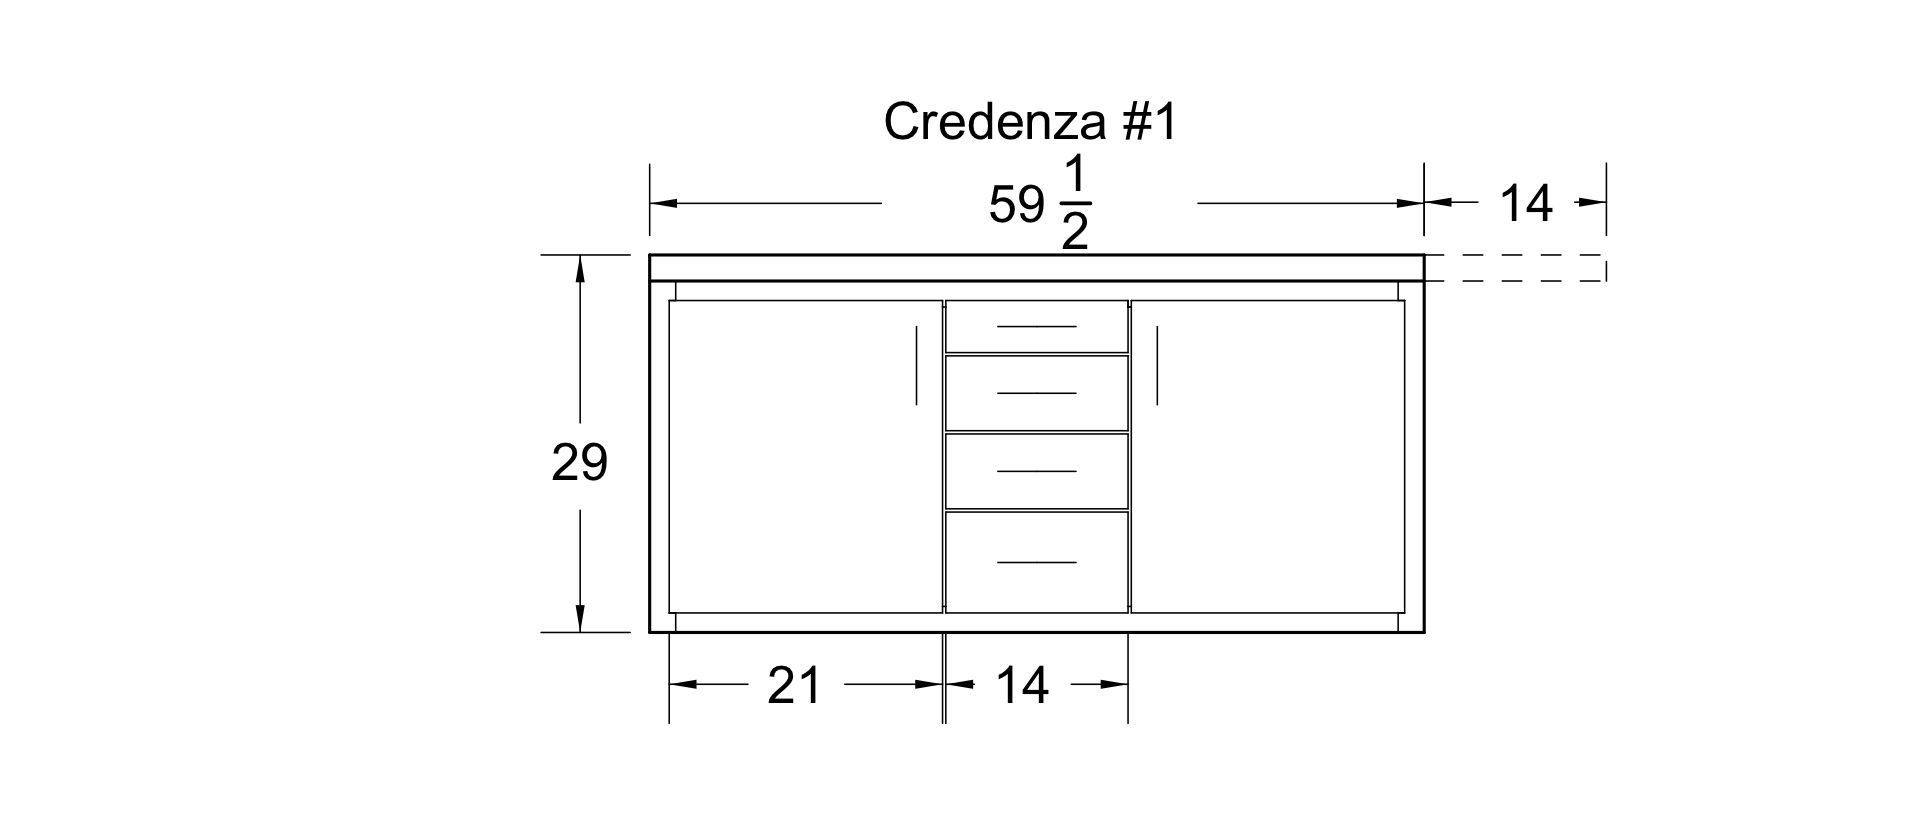 Credenza #1.png